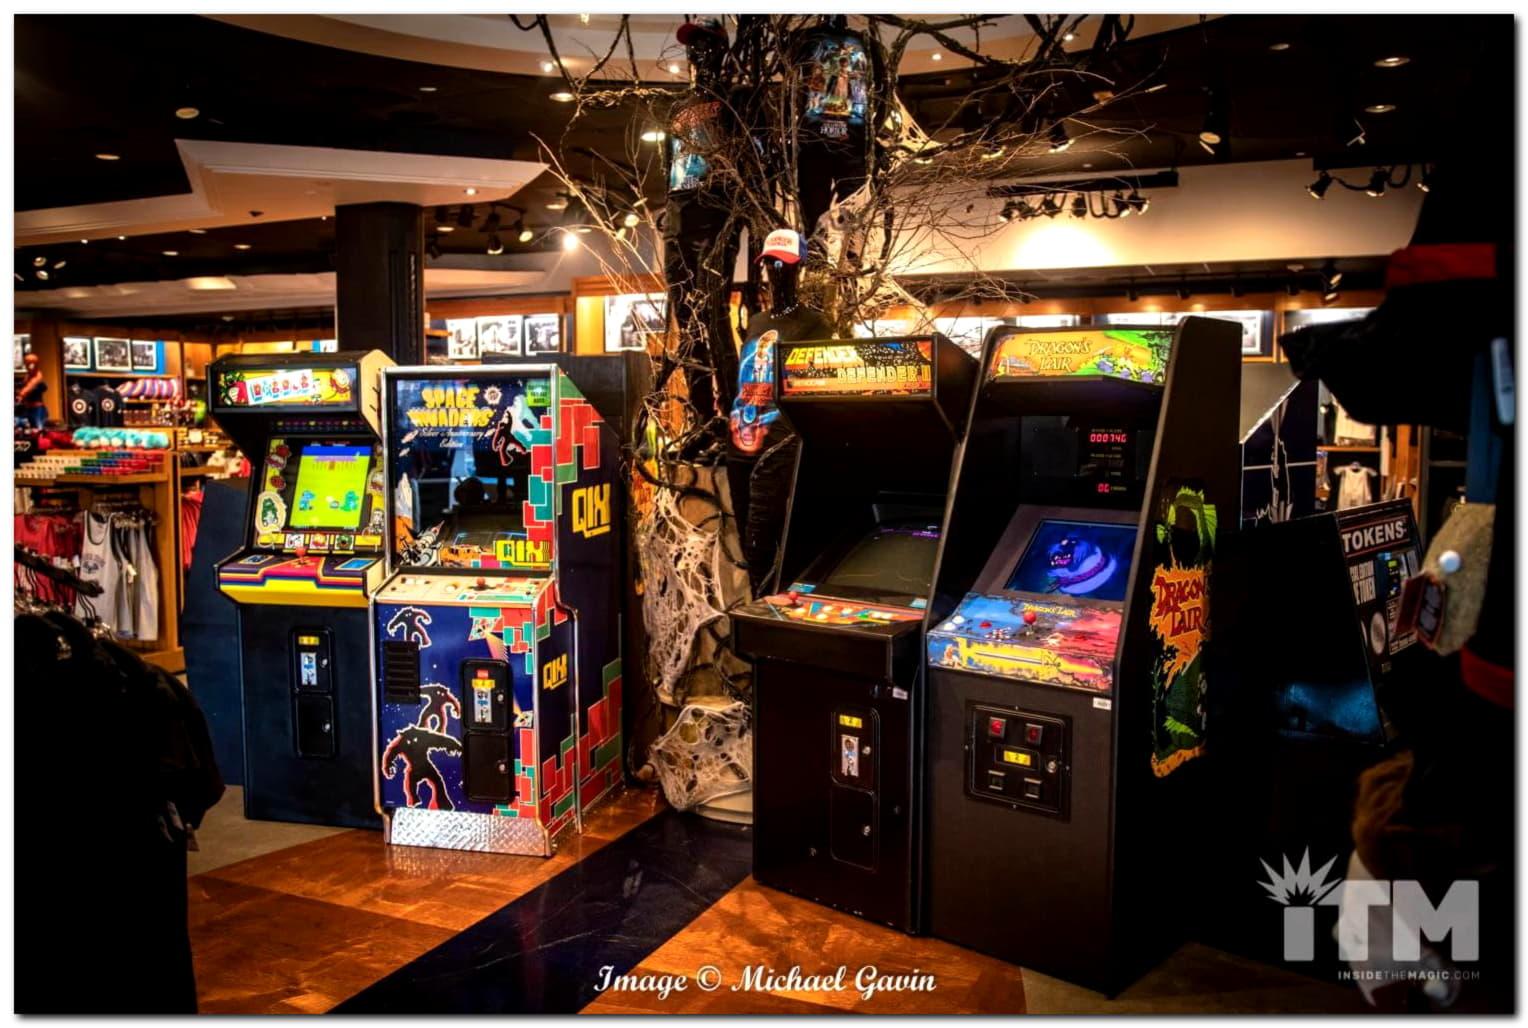 EURO 630 Casino Tournament at Omni Slots Casino